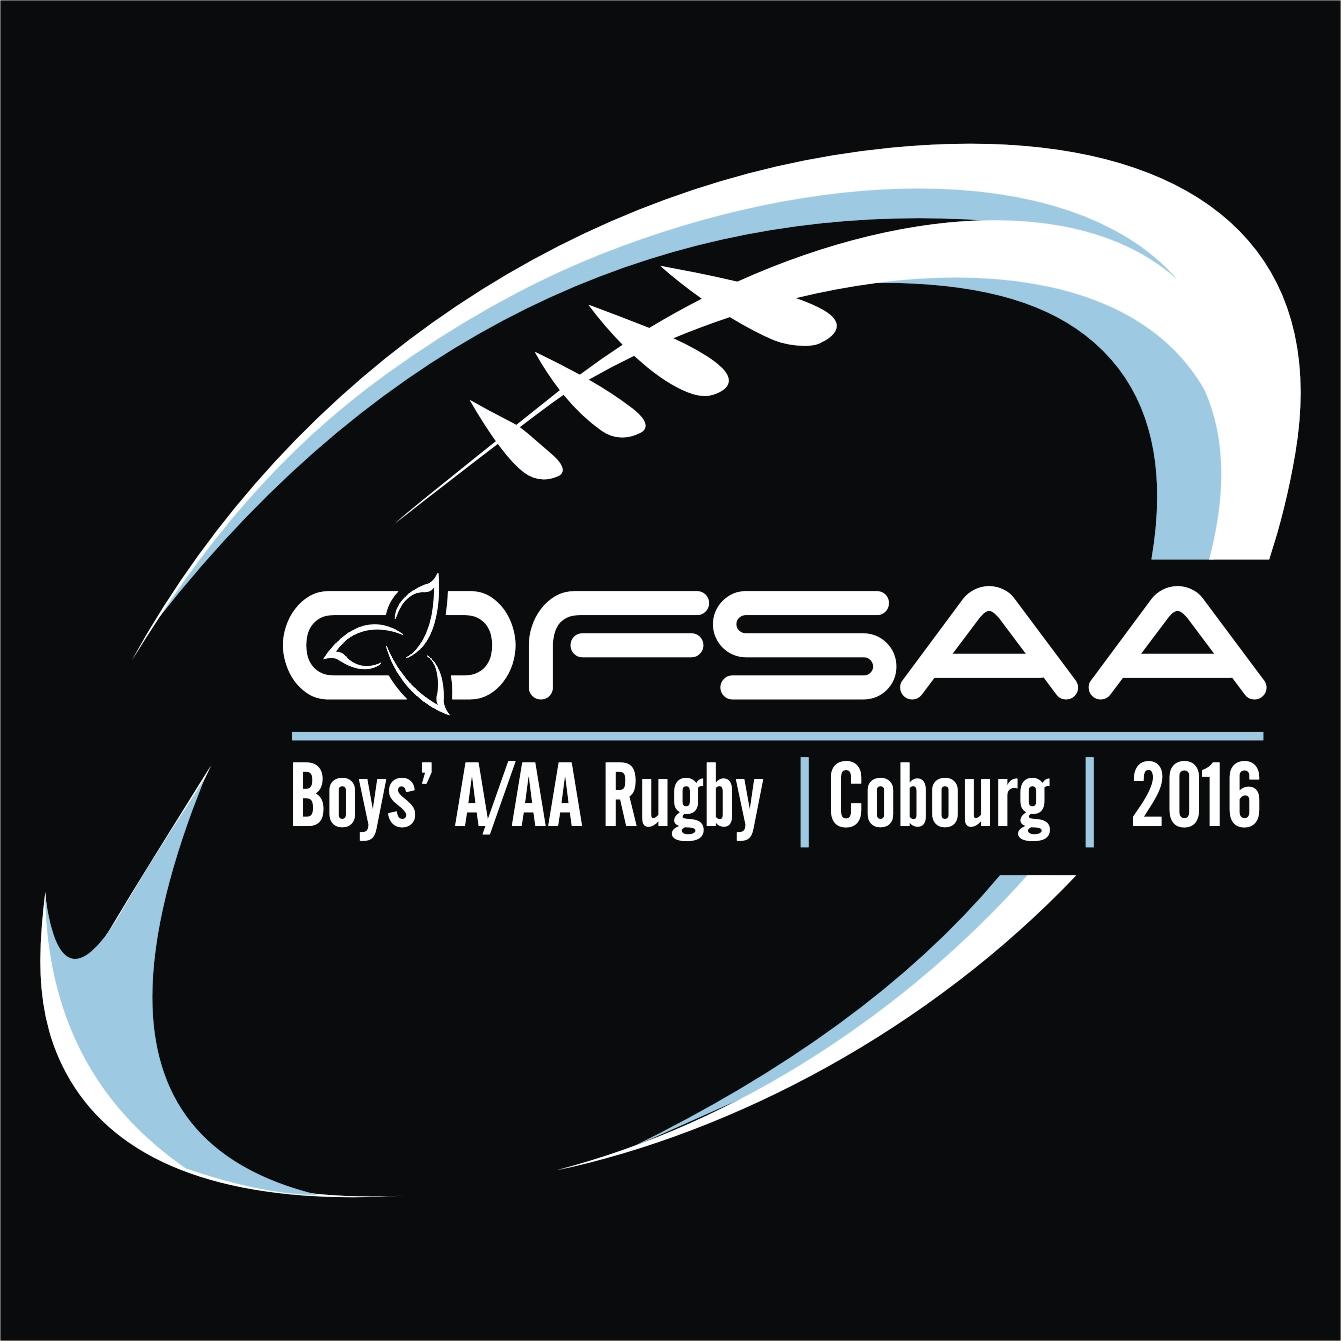 2016 Boys A AA Rugby logo black.jpg